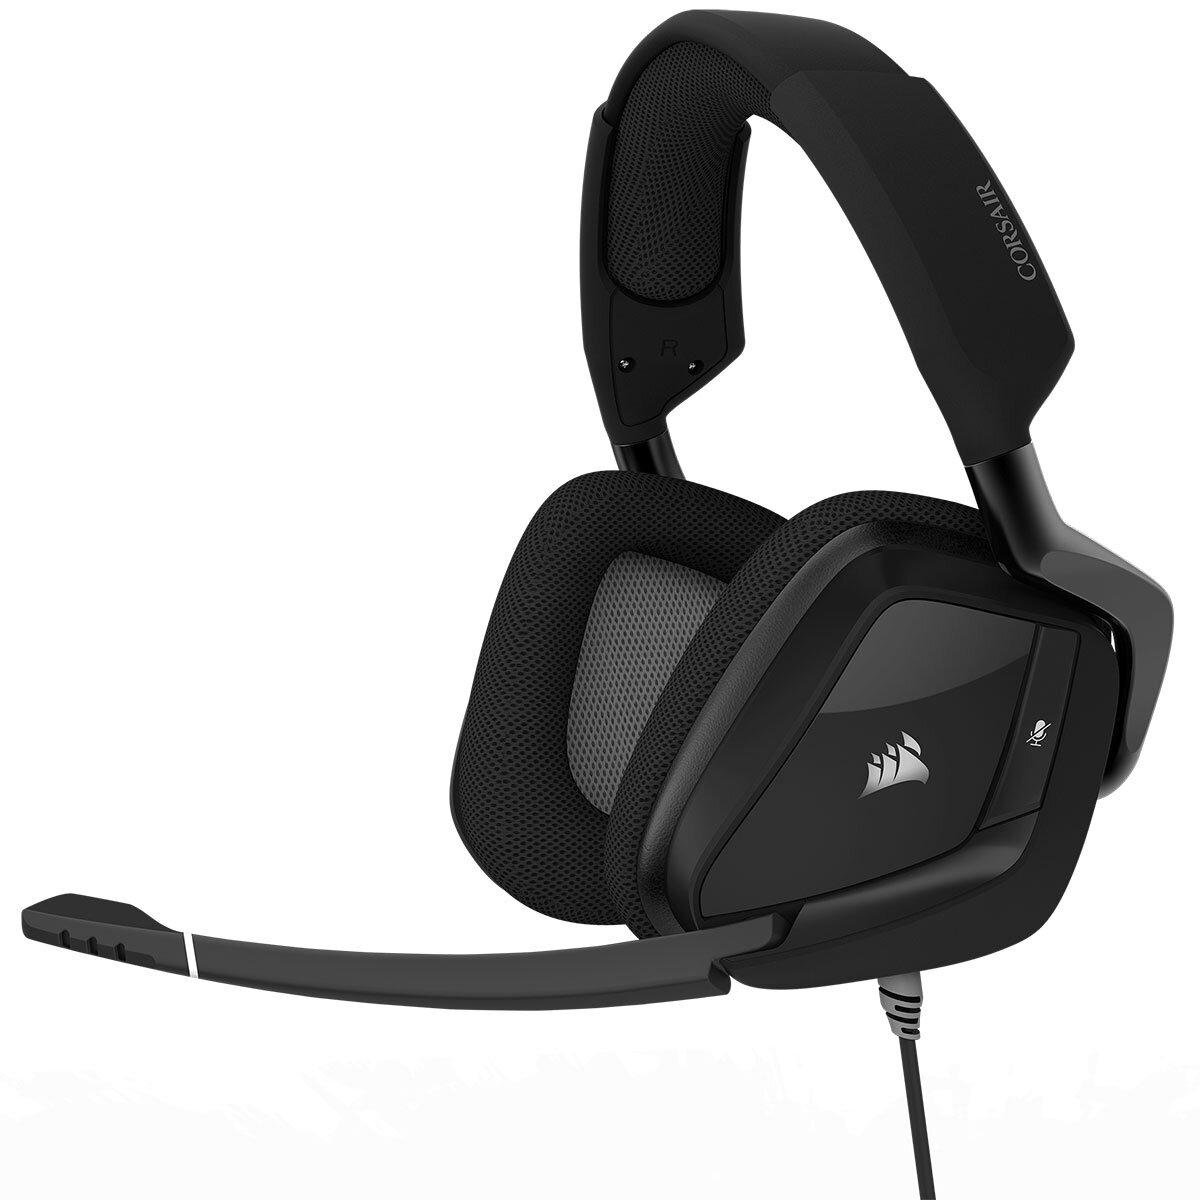 Tai nghe - Headphone Corsair Void Pro RGB USB